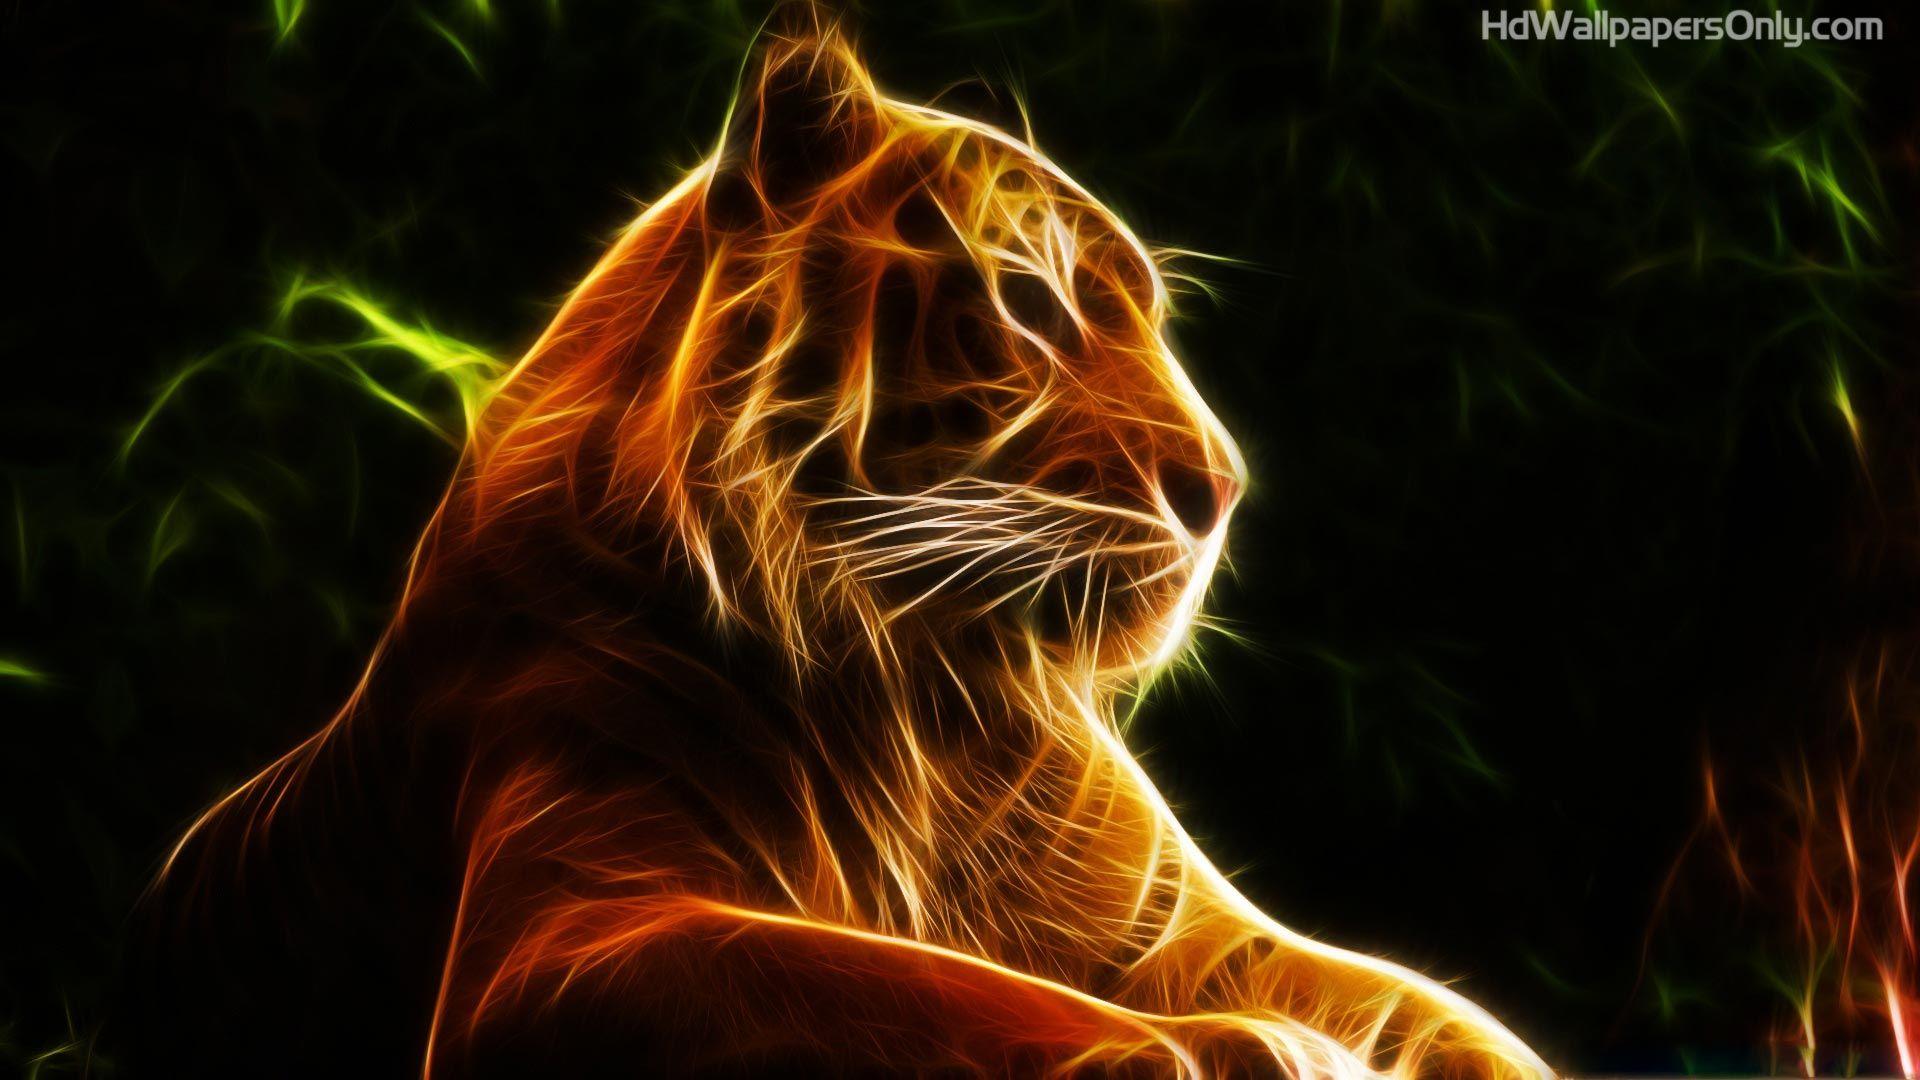 Pin Oleh Adney S Di P A Inspiration Panther Trippy Naruto Uzumaki